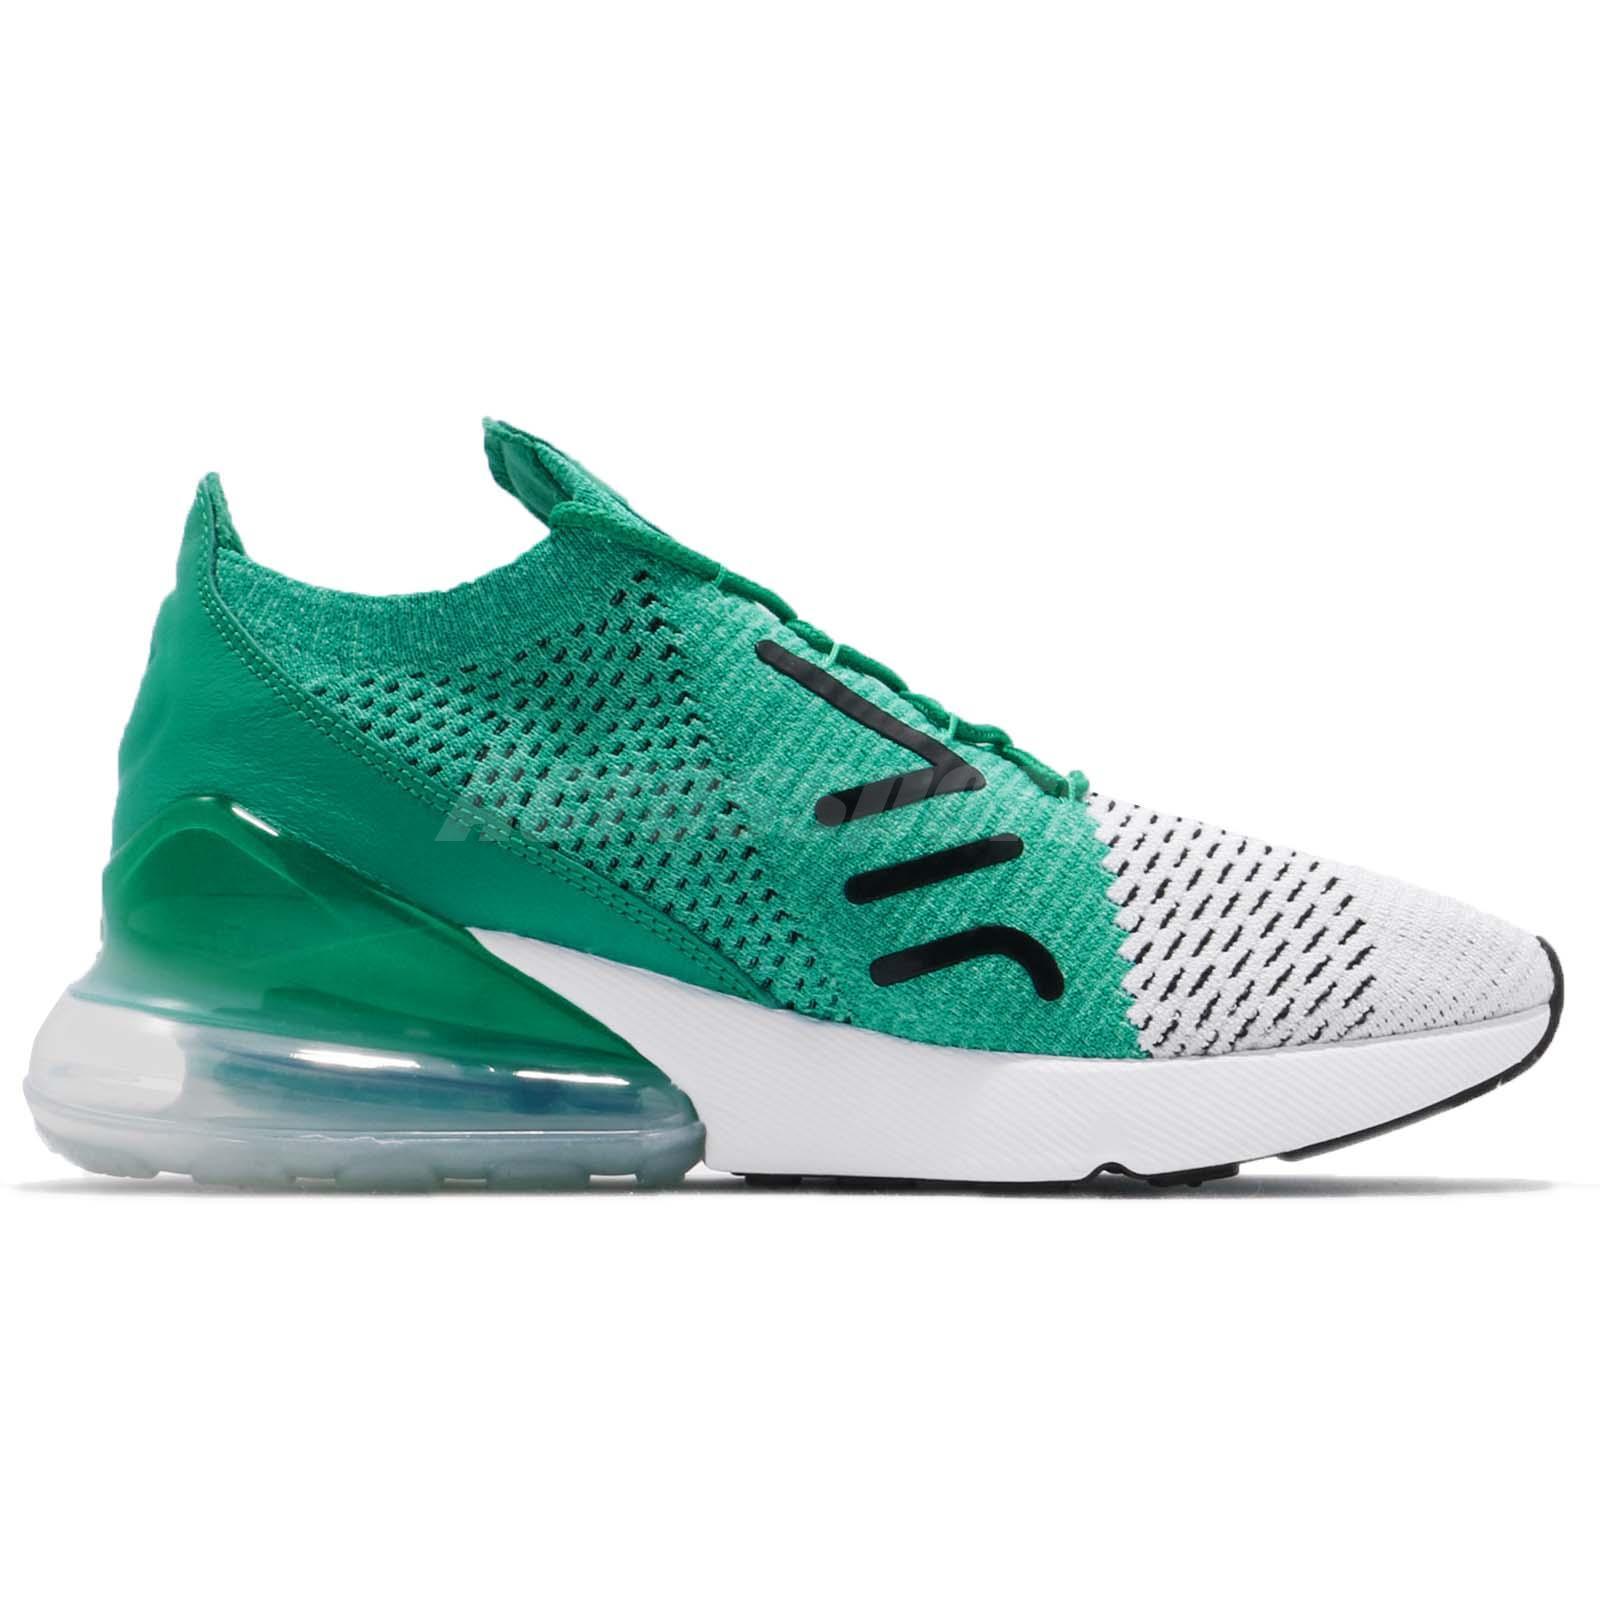 a4b11a6c8af Nike Wmns Air Max 270 Flyknit Clear Emerald Green Women Running ...